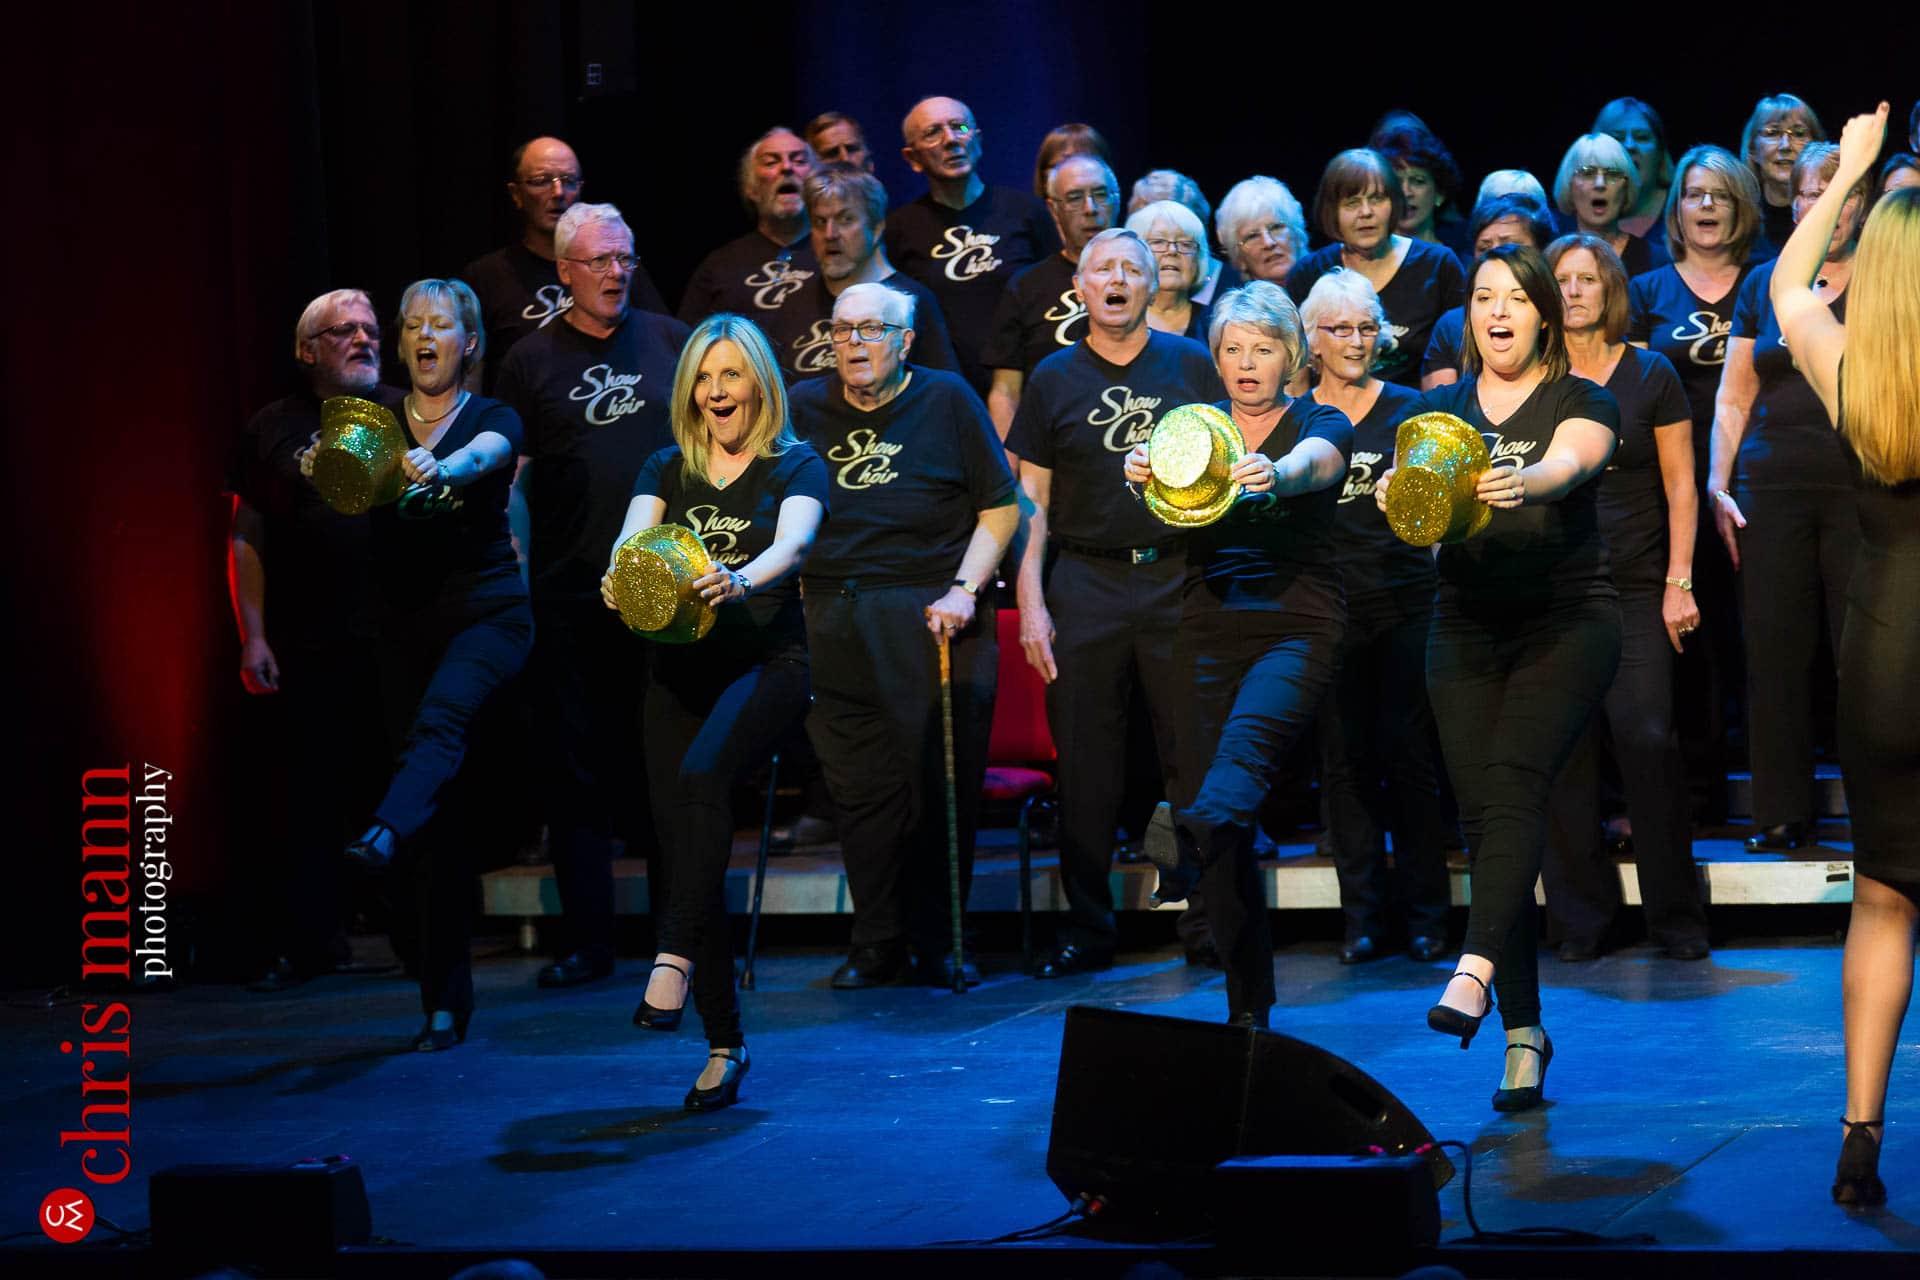 Choiroke-2016-concert-Dorking-Halls-091